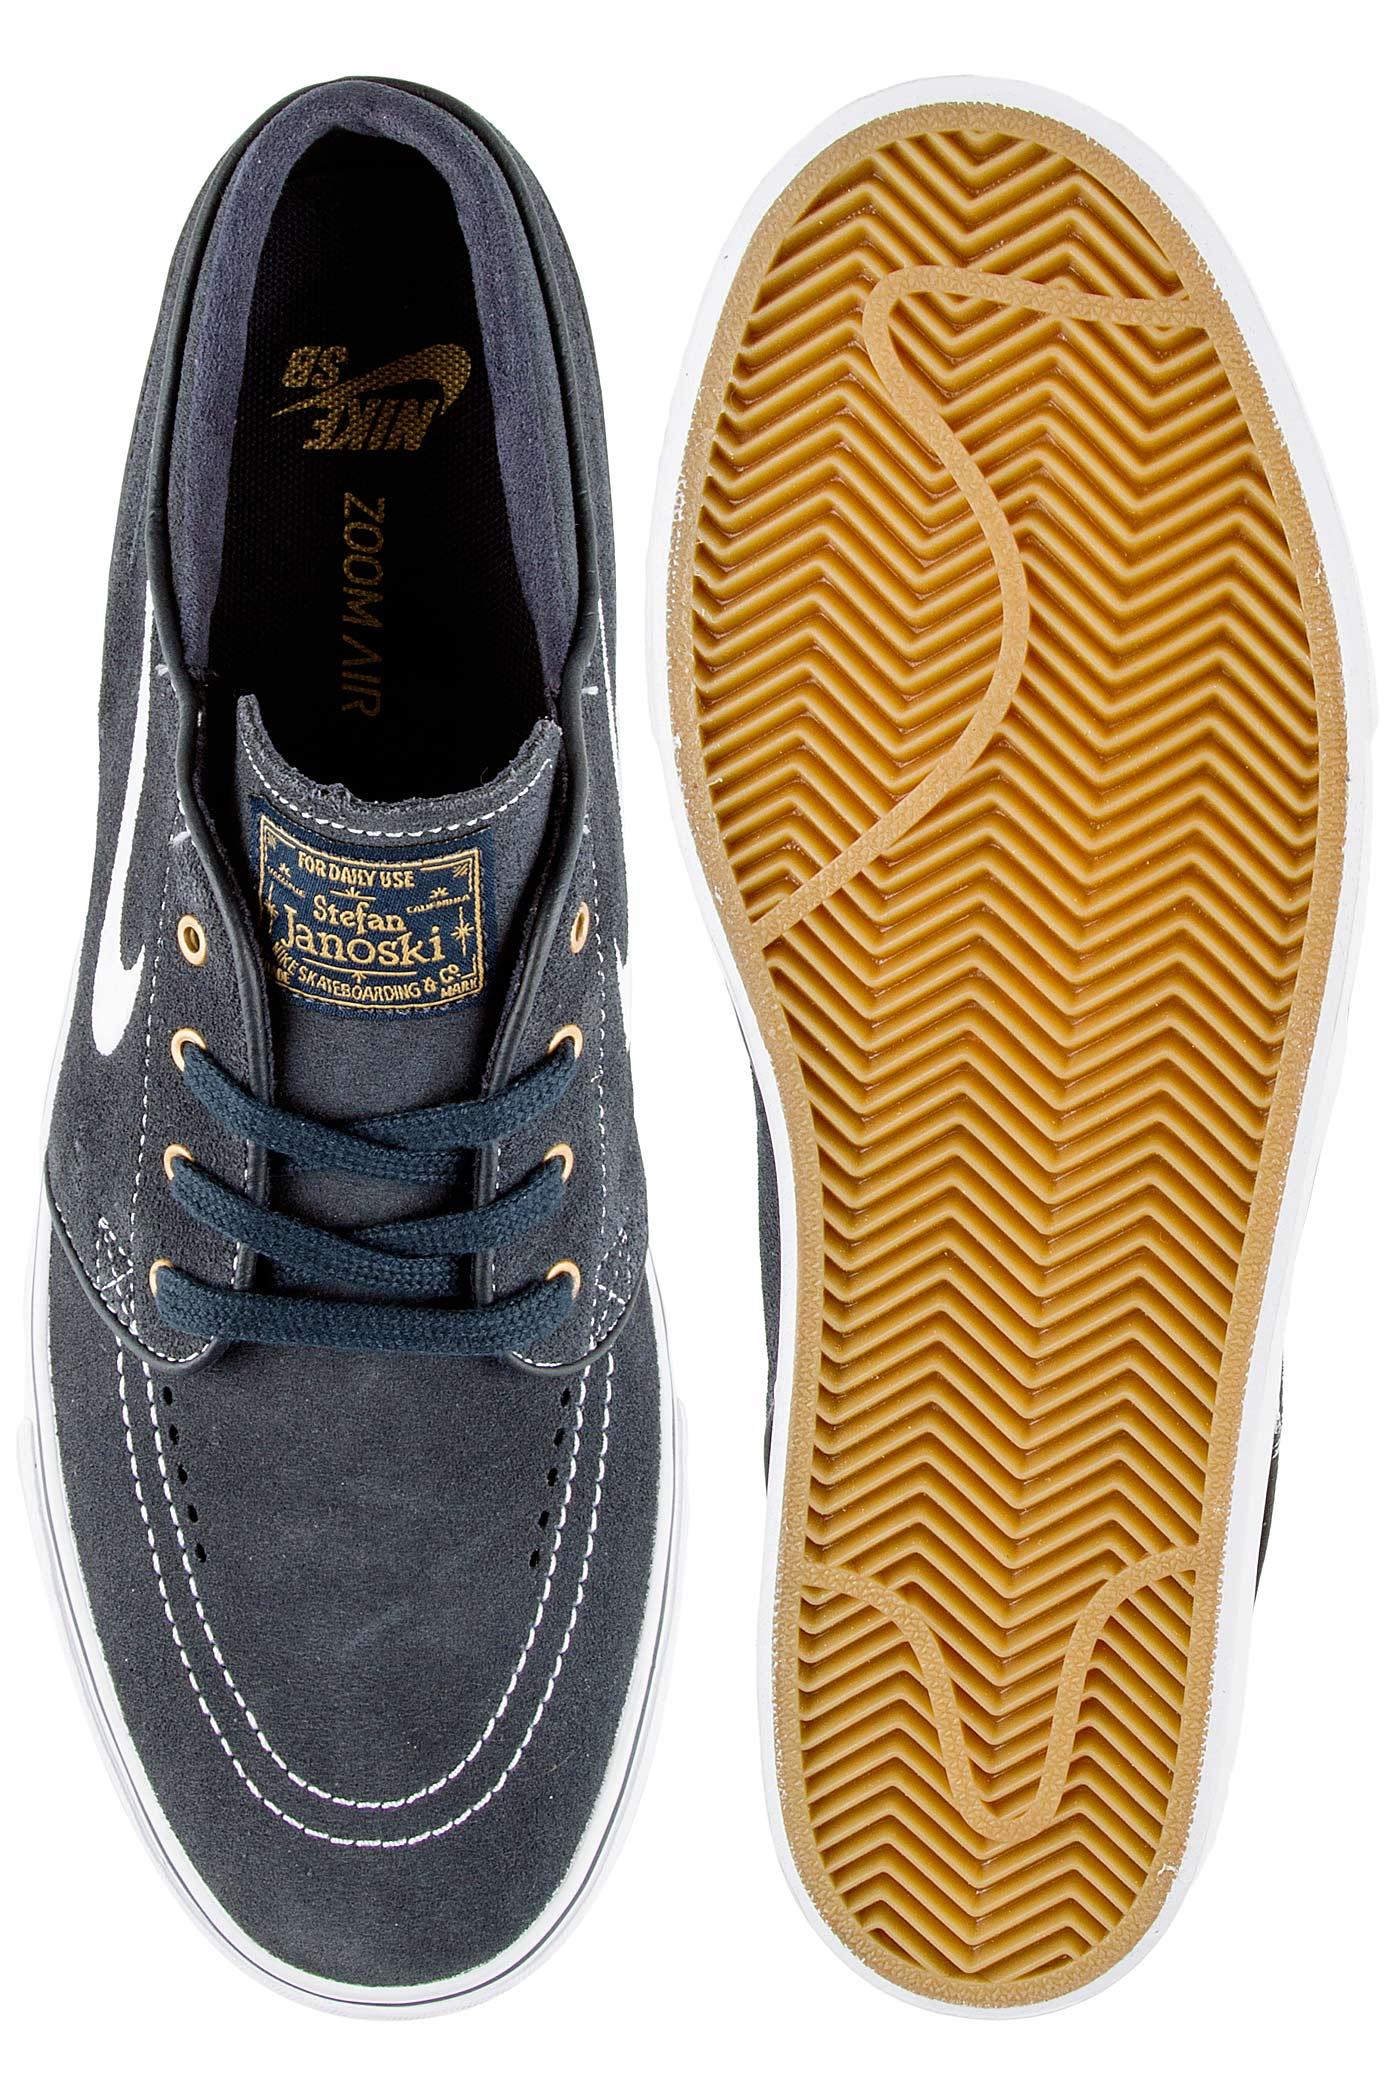 5e98ebc2f7b5fa Nike SB Zoom Stefan Janoski Shoe (dark obsidian white) buy at ...